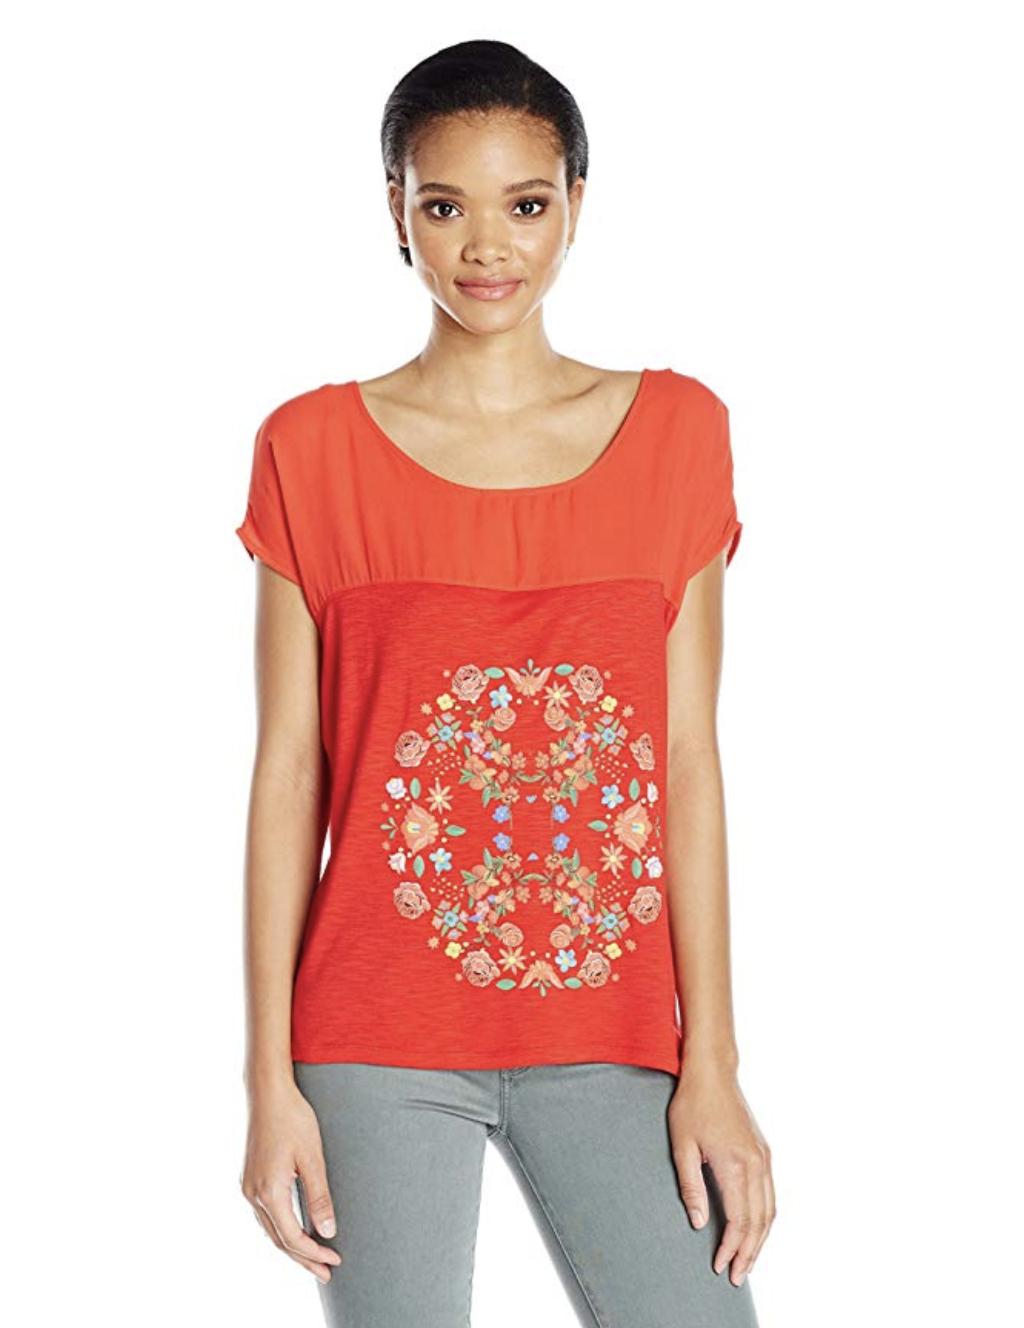 Camiseta manga corta y roja de Desigual